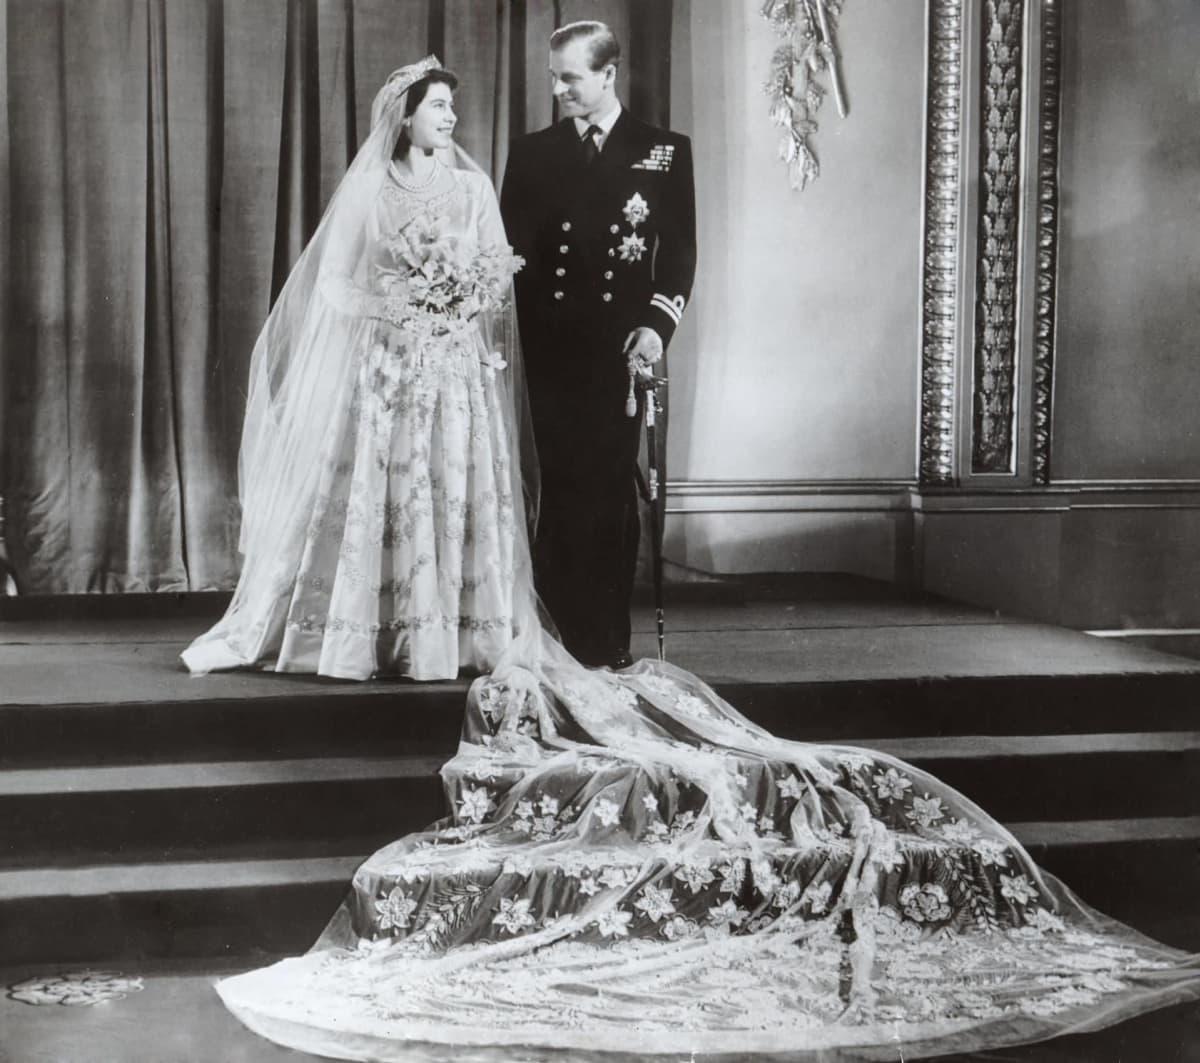 Prinssi Philip ja prinsessa Elizabeth hääpuvuissa